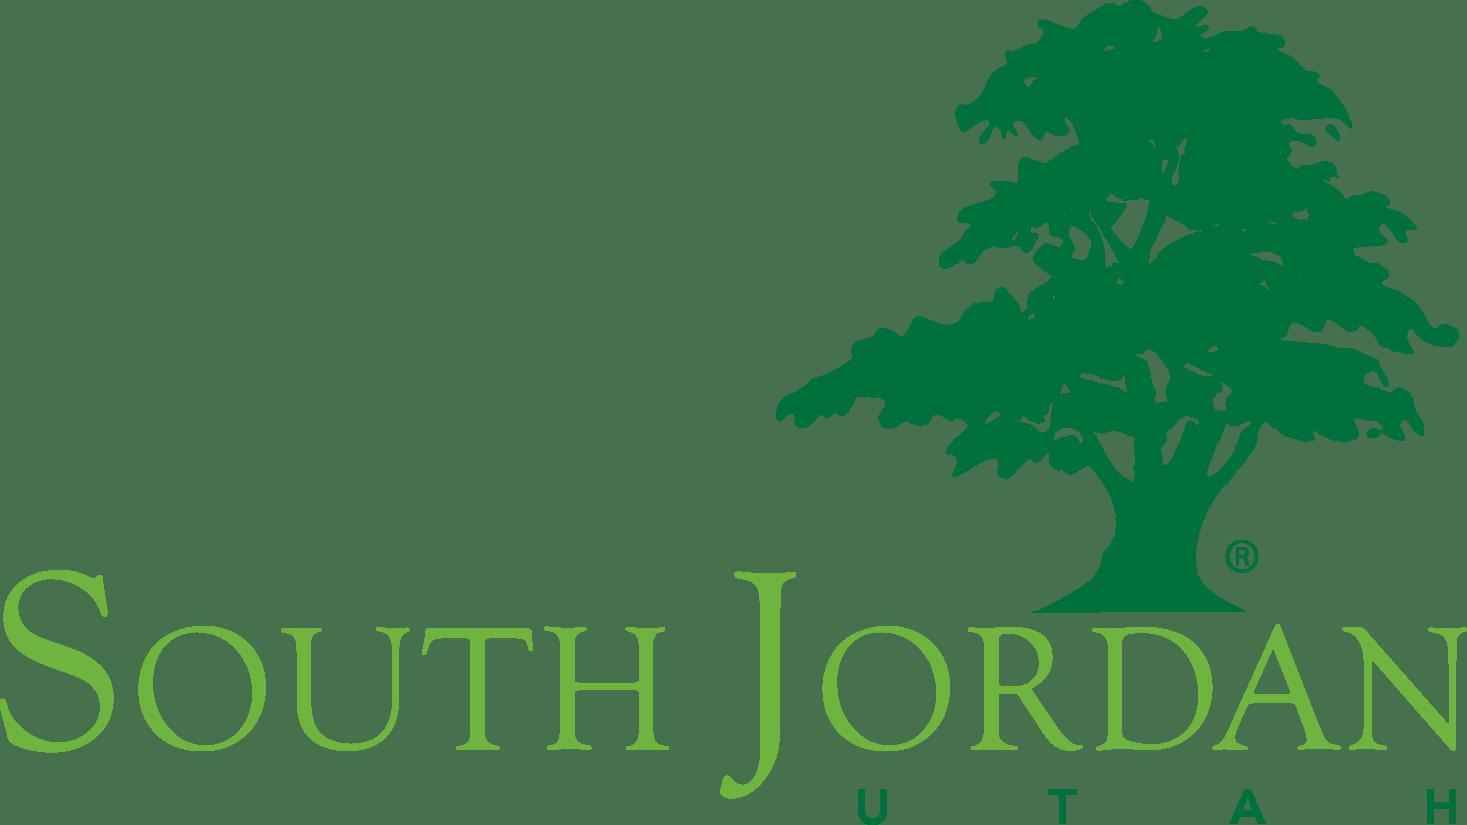 South Jordan General Plan